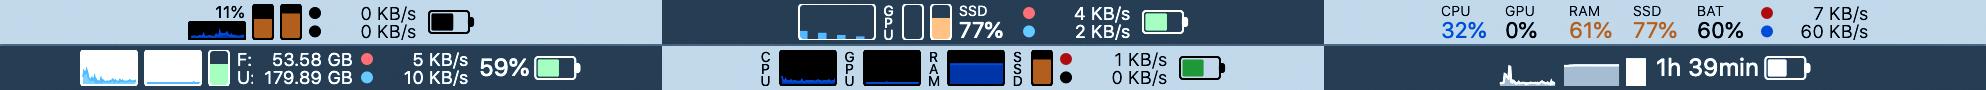 Stats Screenshot